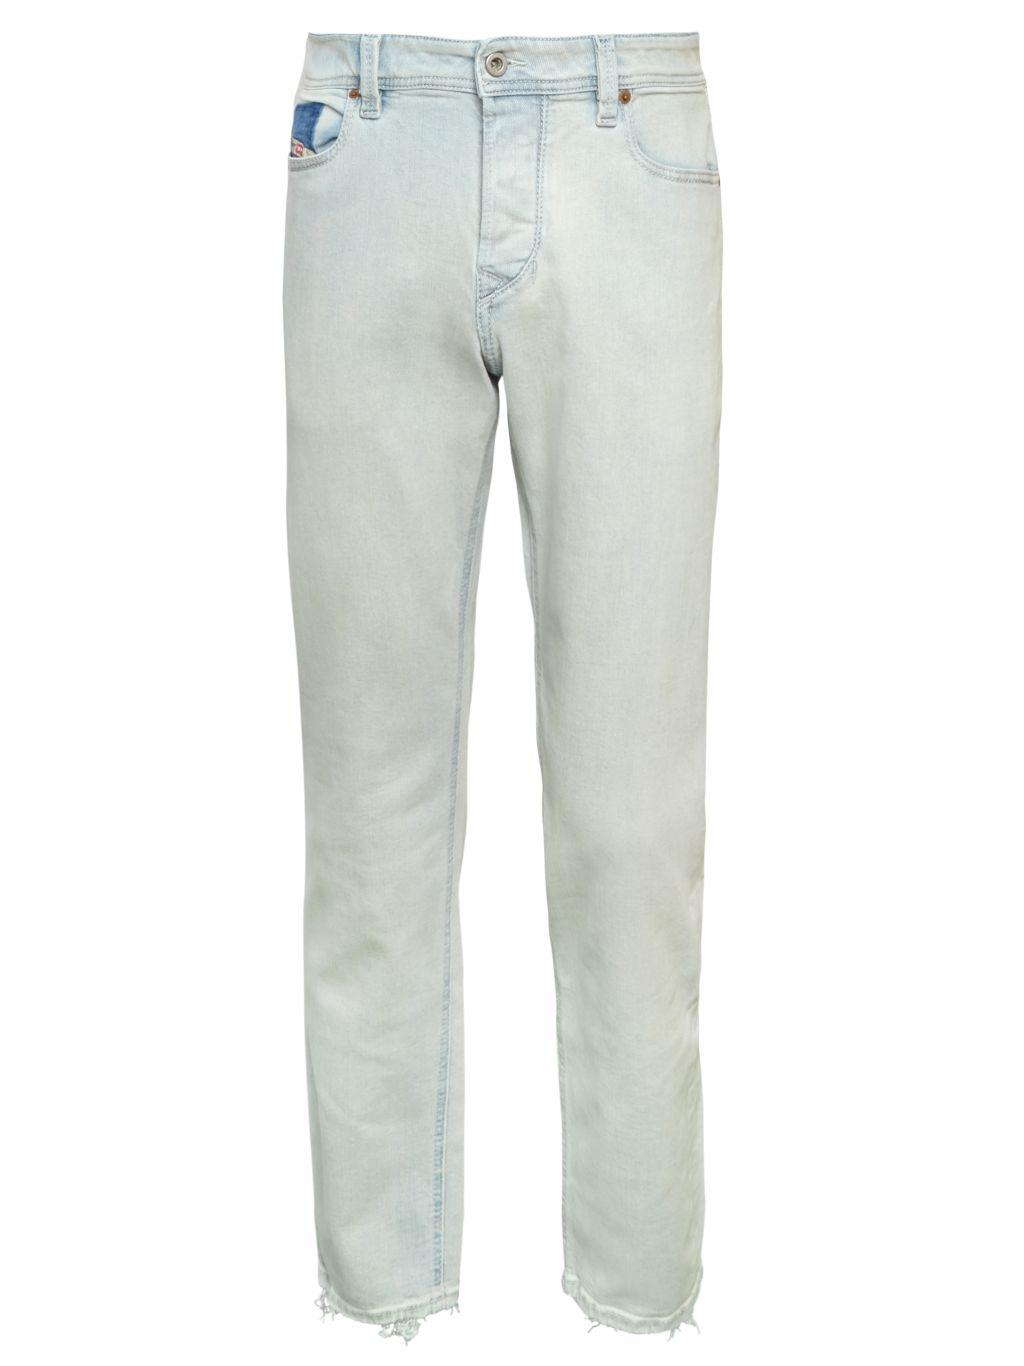 Diesel Larkee Straight Jeans